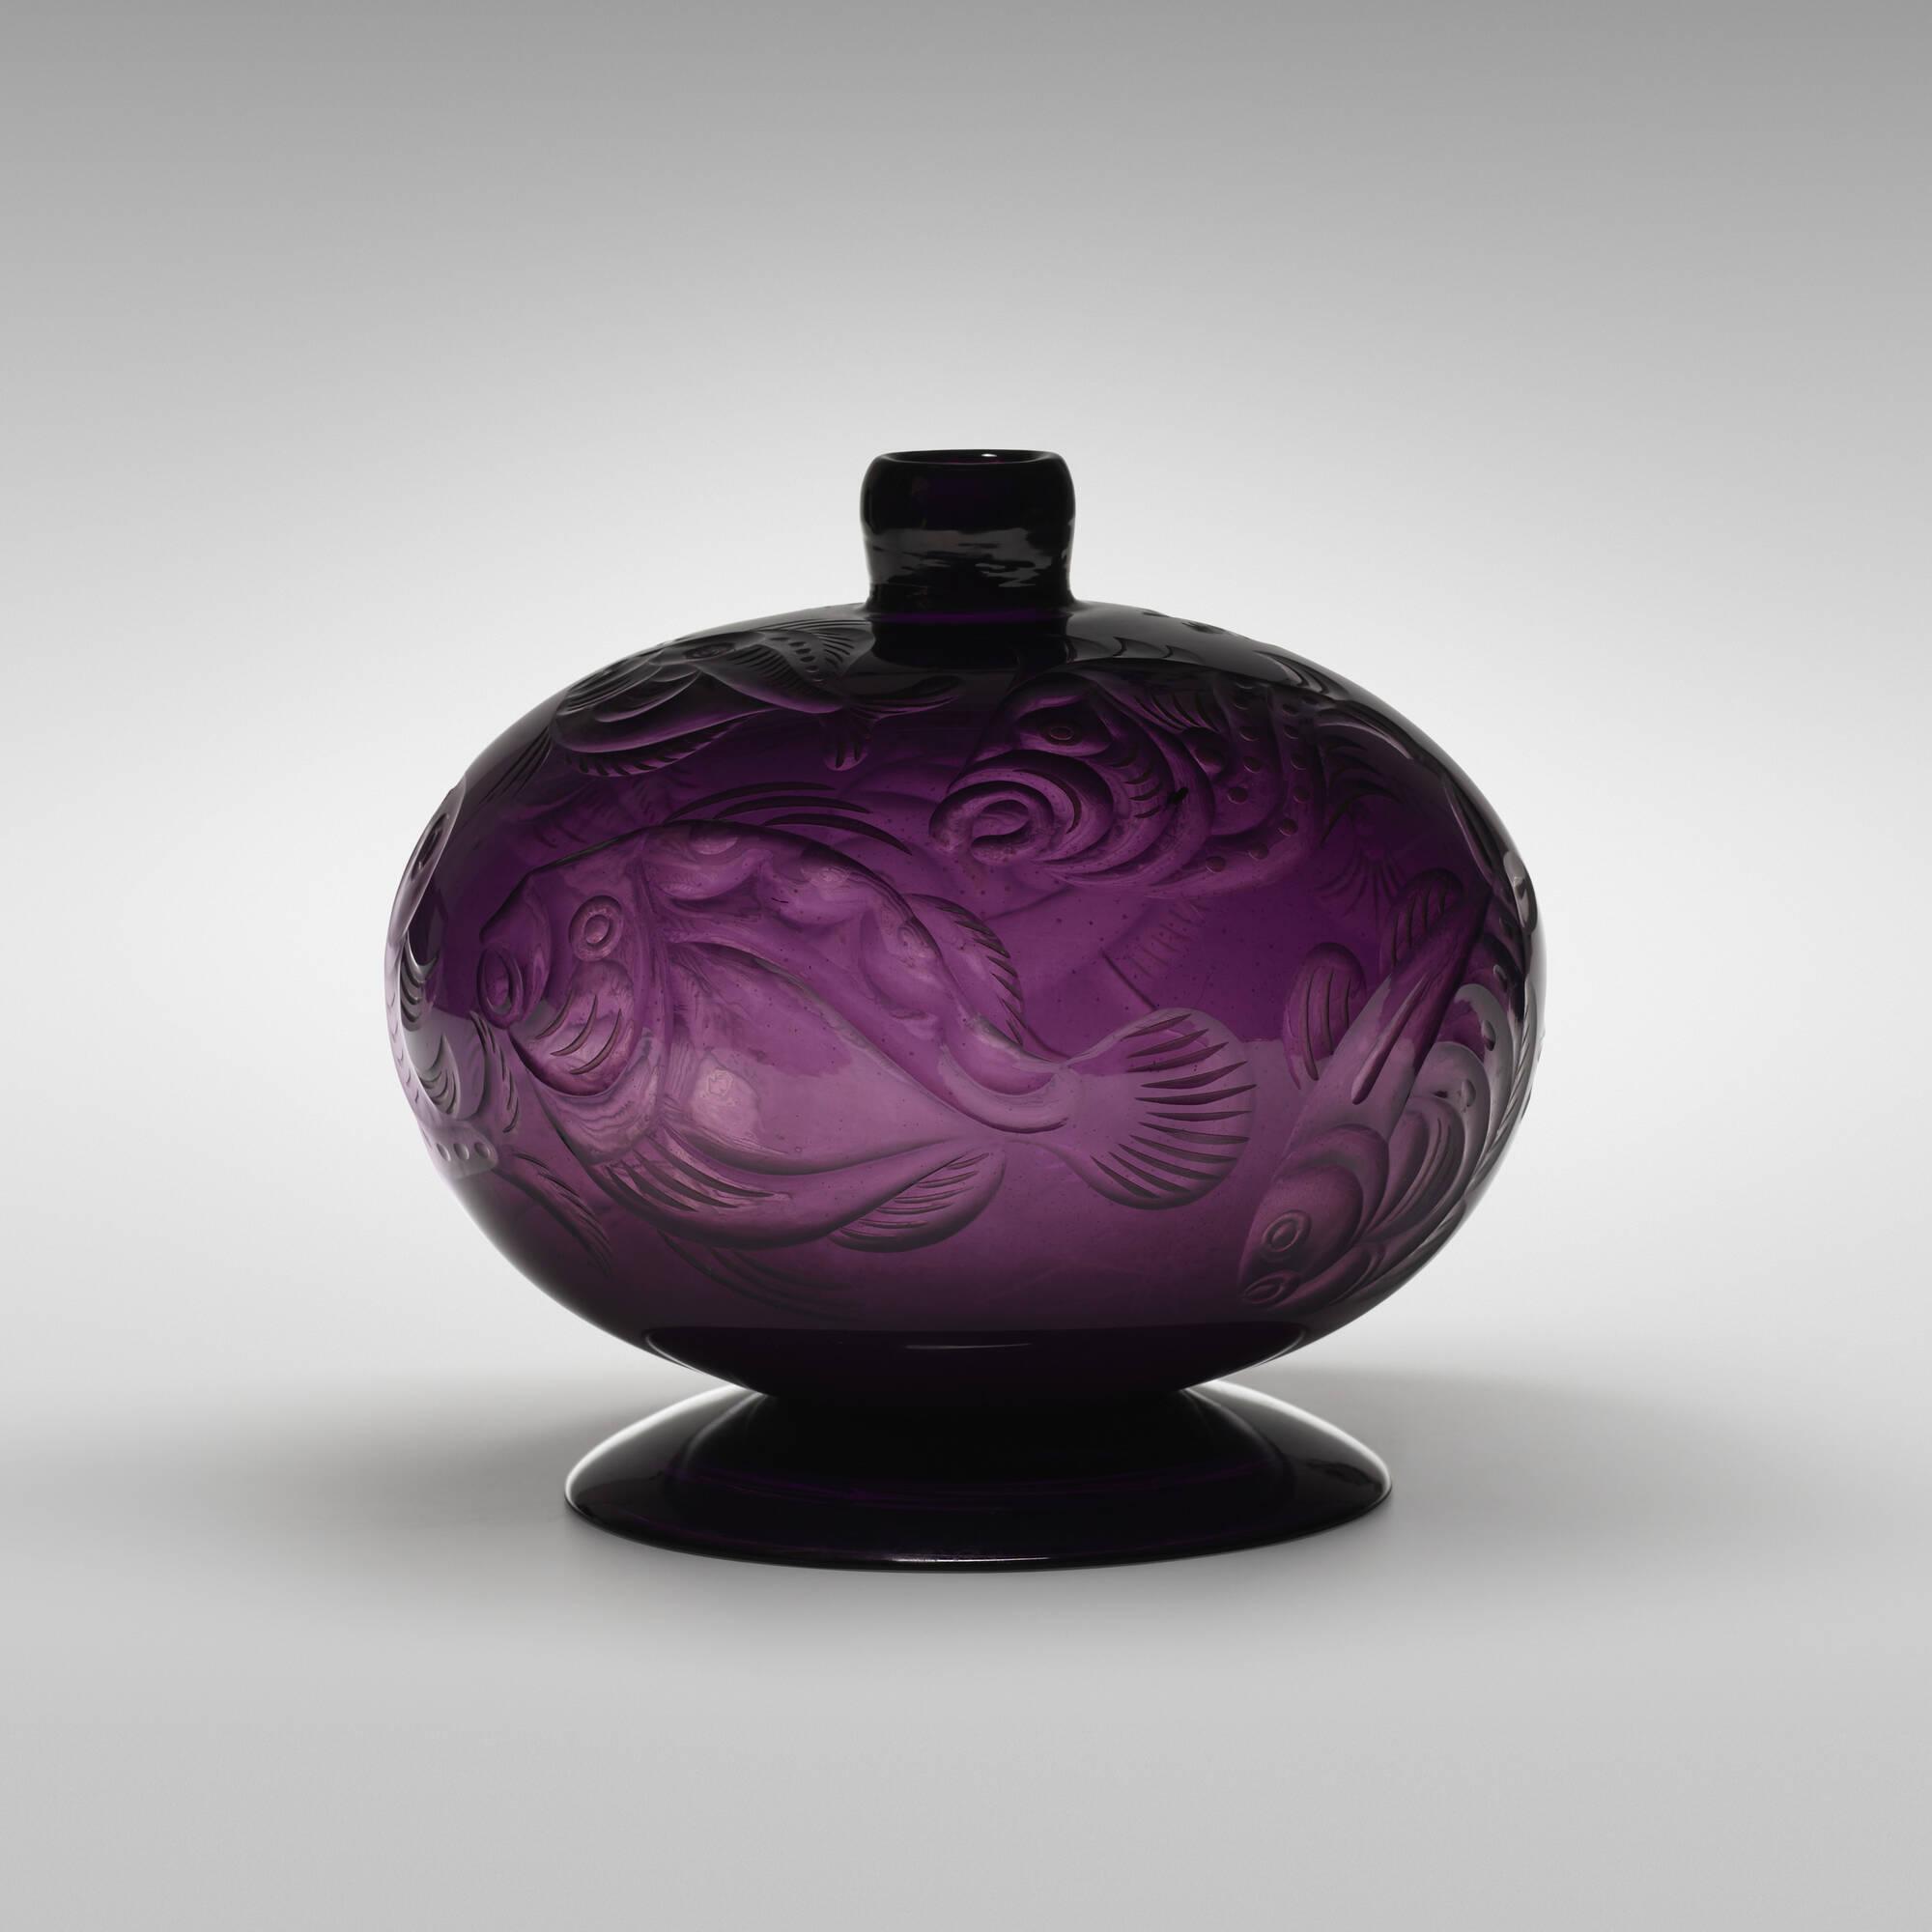 43: Vittorio Zecchin and Franz Pelzel / Unique Pesci vase (2 of 5)